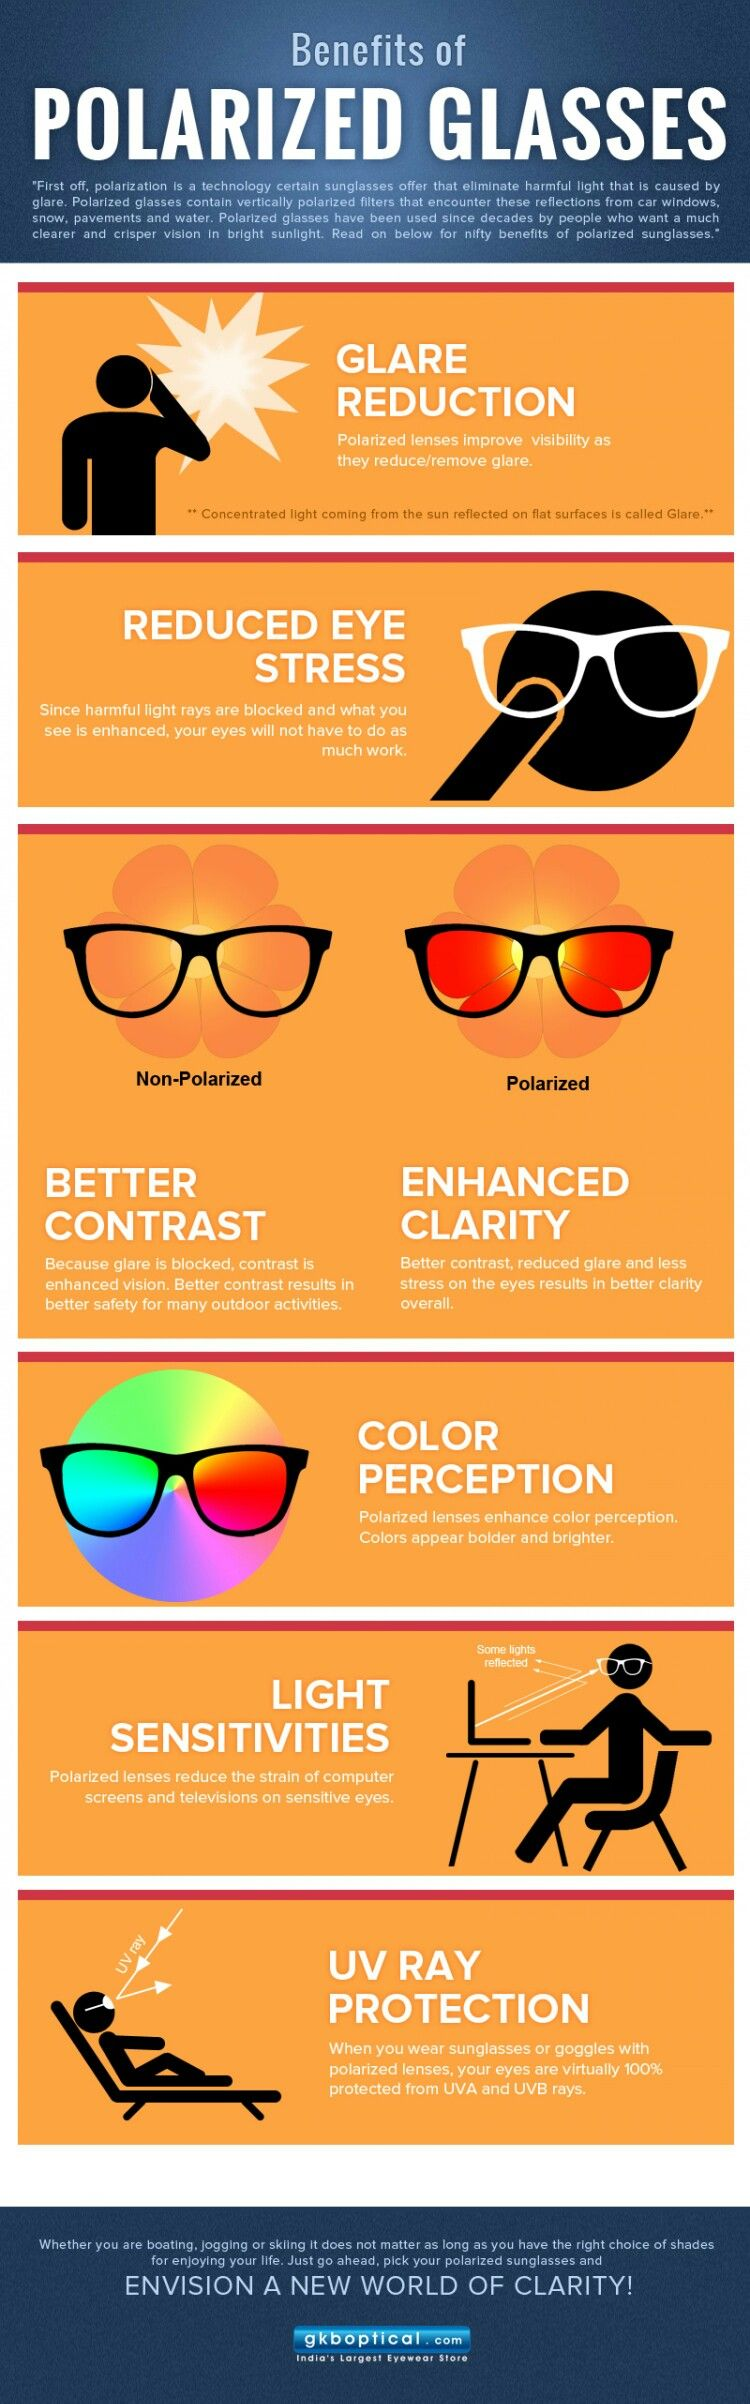 c41913aca0b0 Benefits of Polarized Lenses. Benefits of Polarized Lenses Wooden Sunglasses